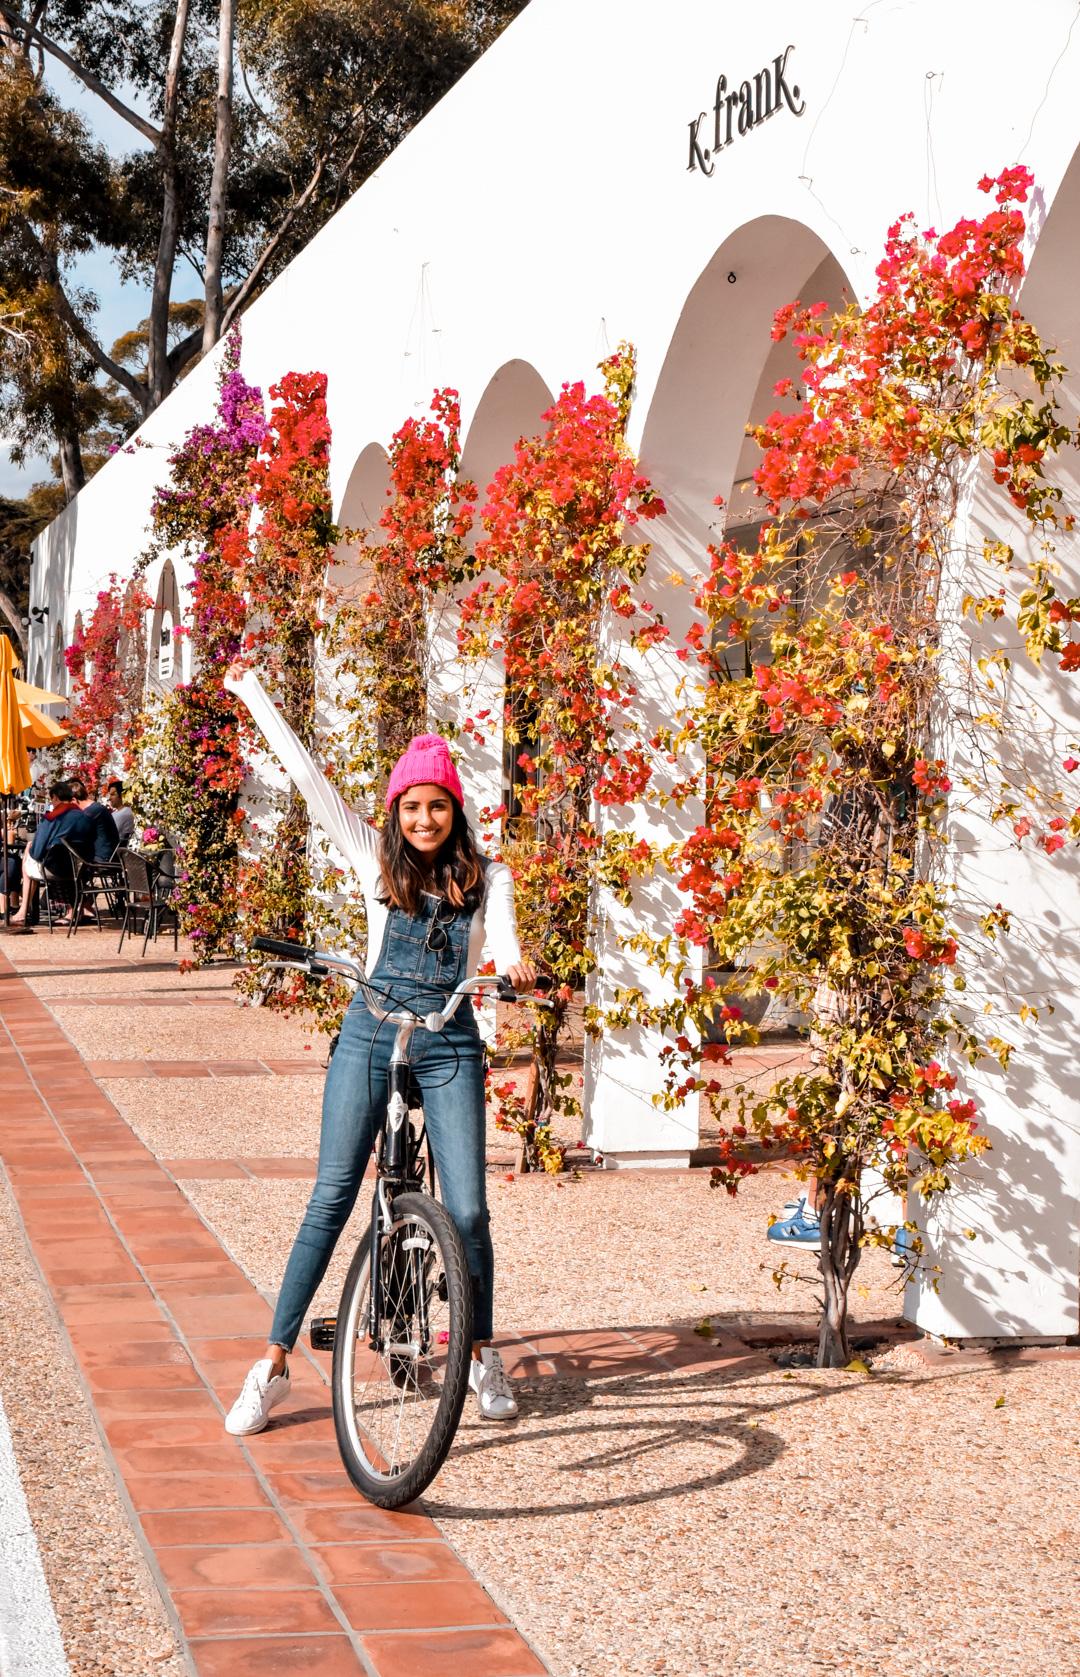 montecito-santa-barbara-travel-guide-blogger 18